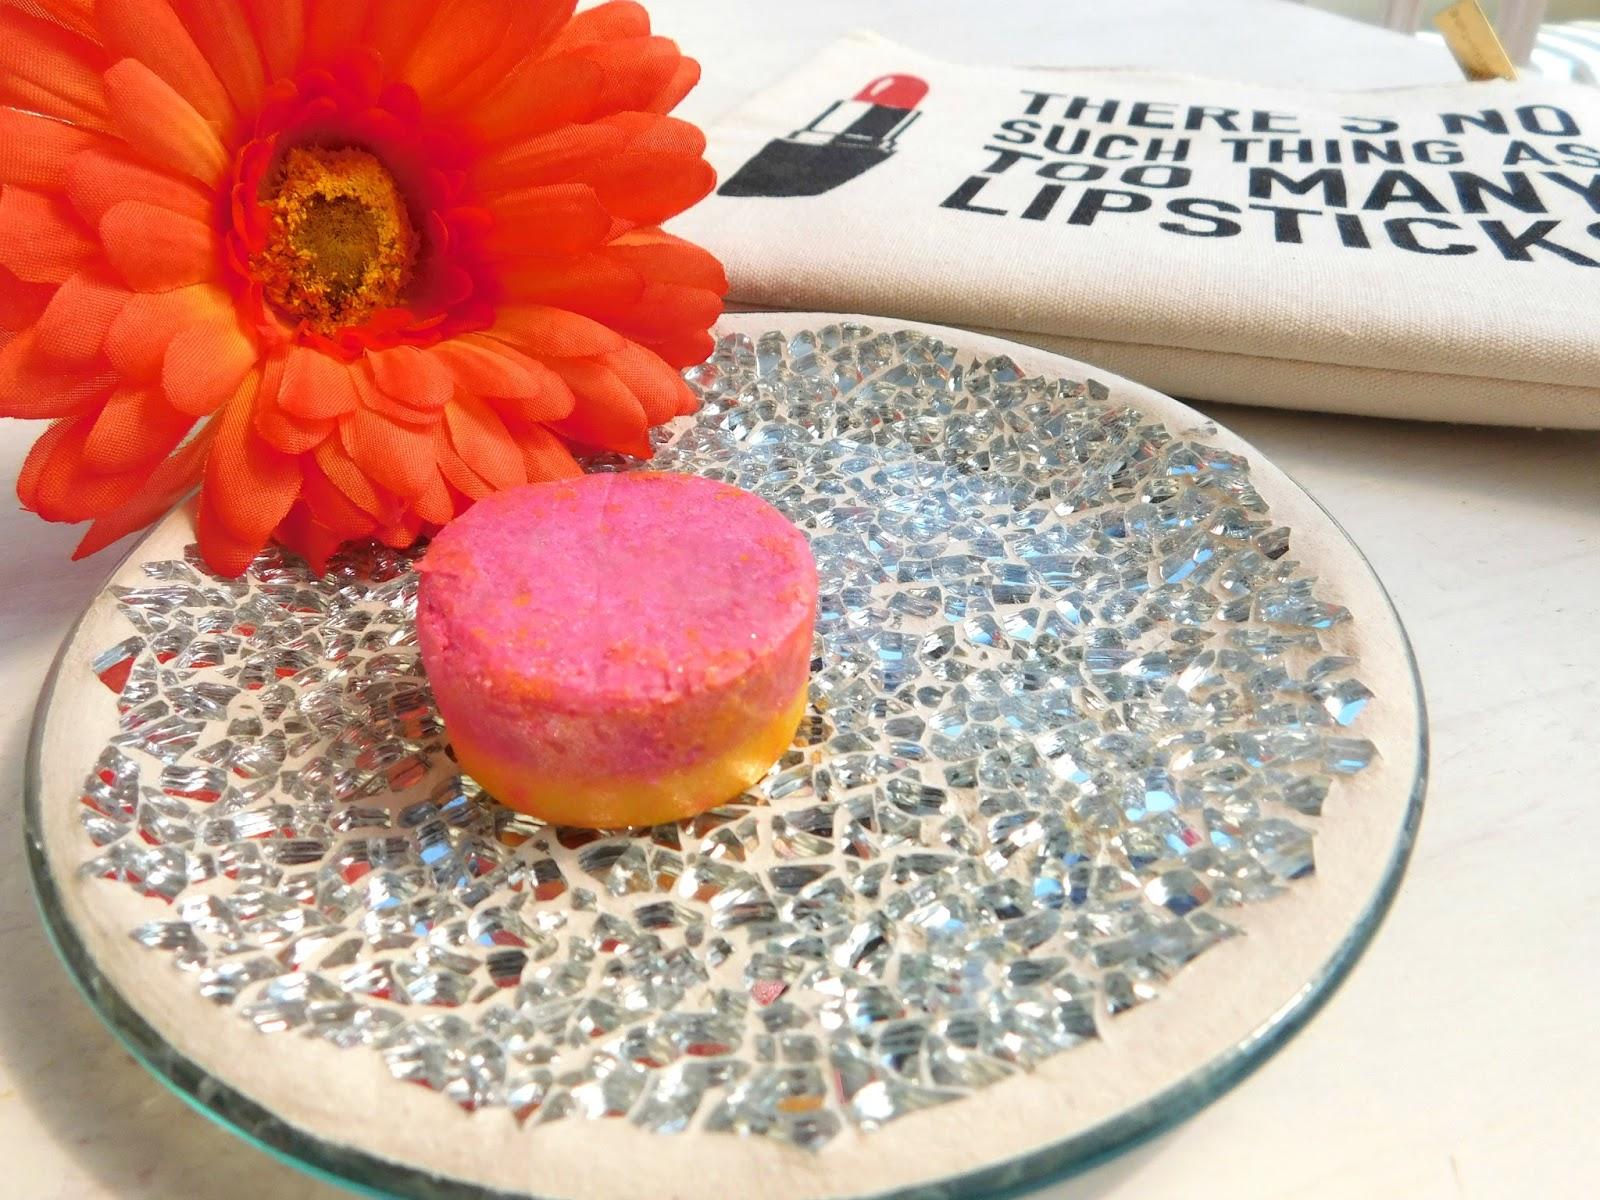 Lush Haul, Lush Favourite Products, Flamingo Lush, Marshmallow Lush, Lush Bubble Bar